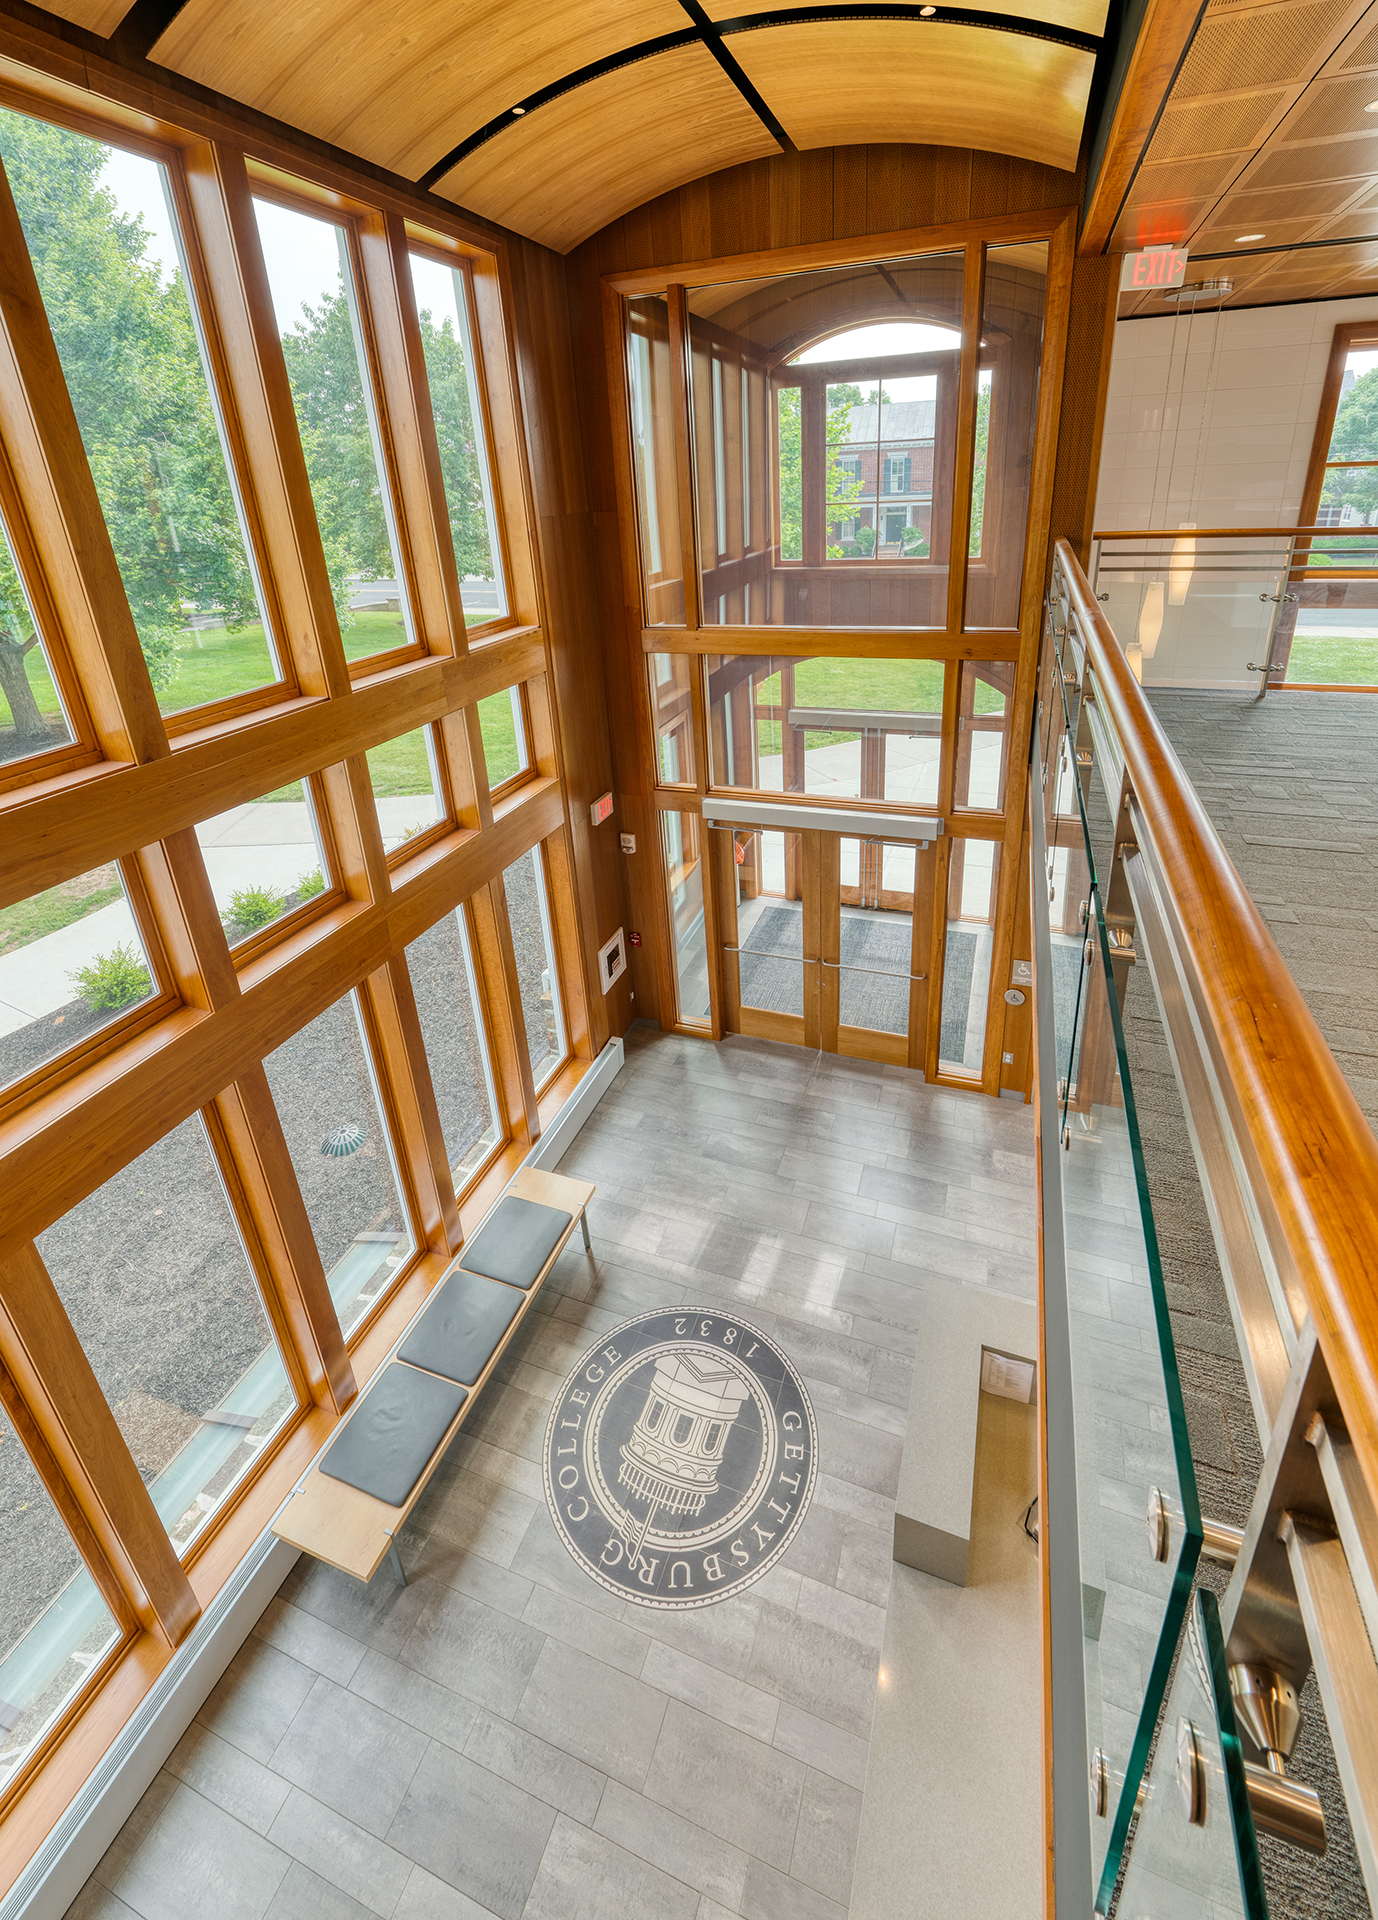 Interior Design Our Expertise Noelker And Hull Associates Inc